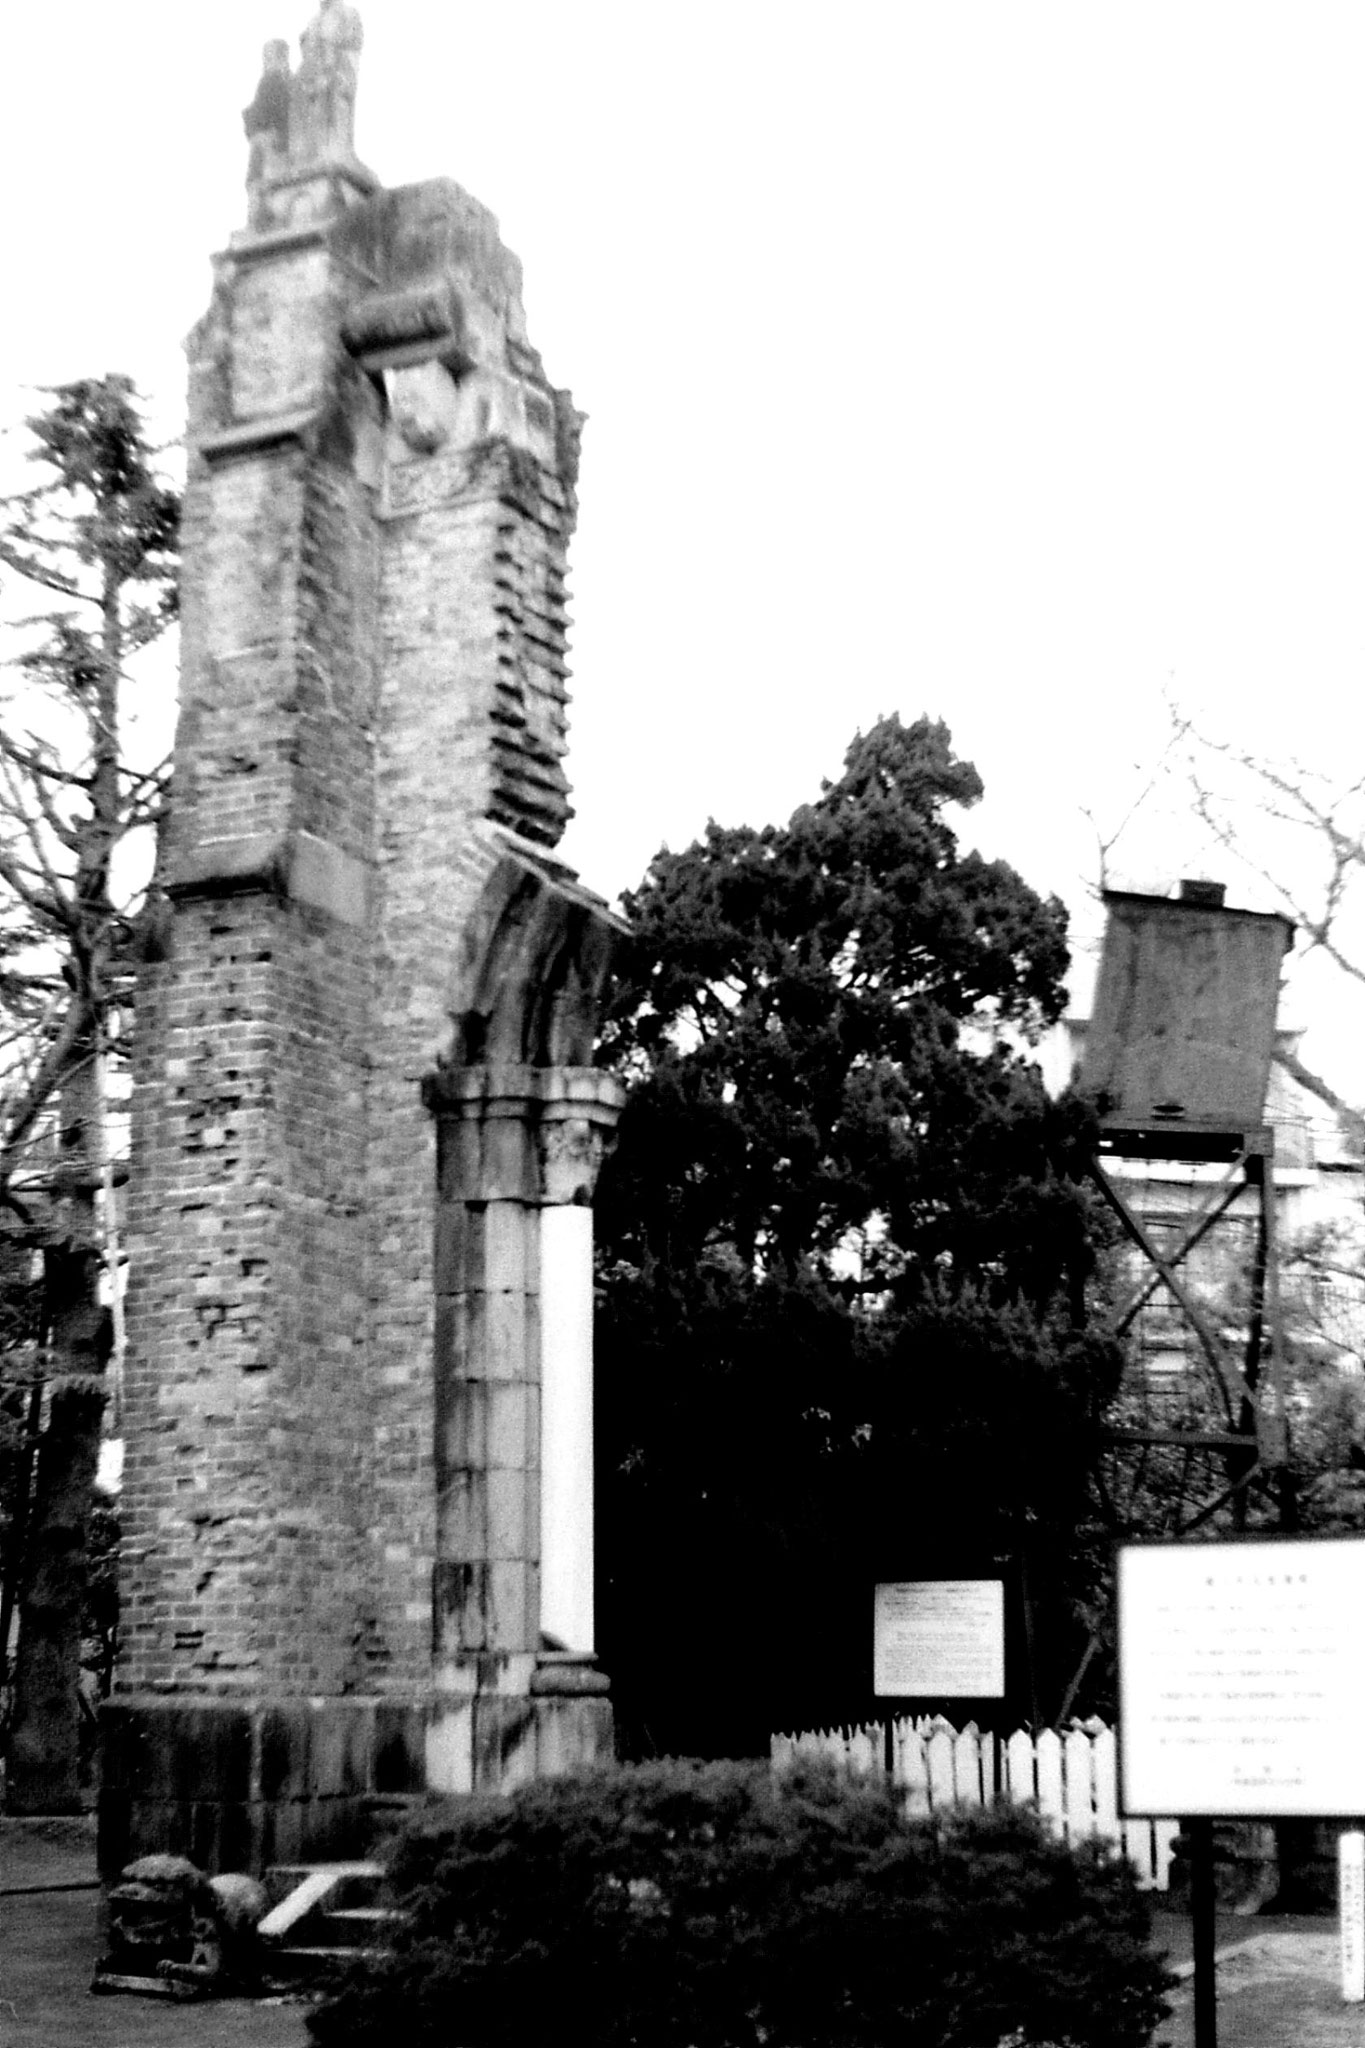 20/1/1989: -1: Nagasaki hypocentre memorial